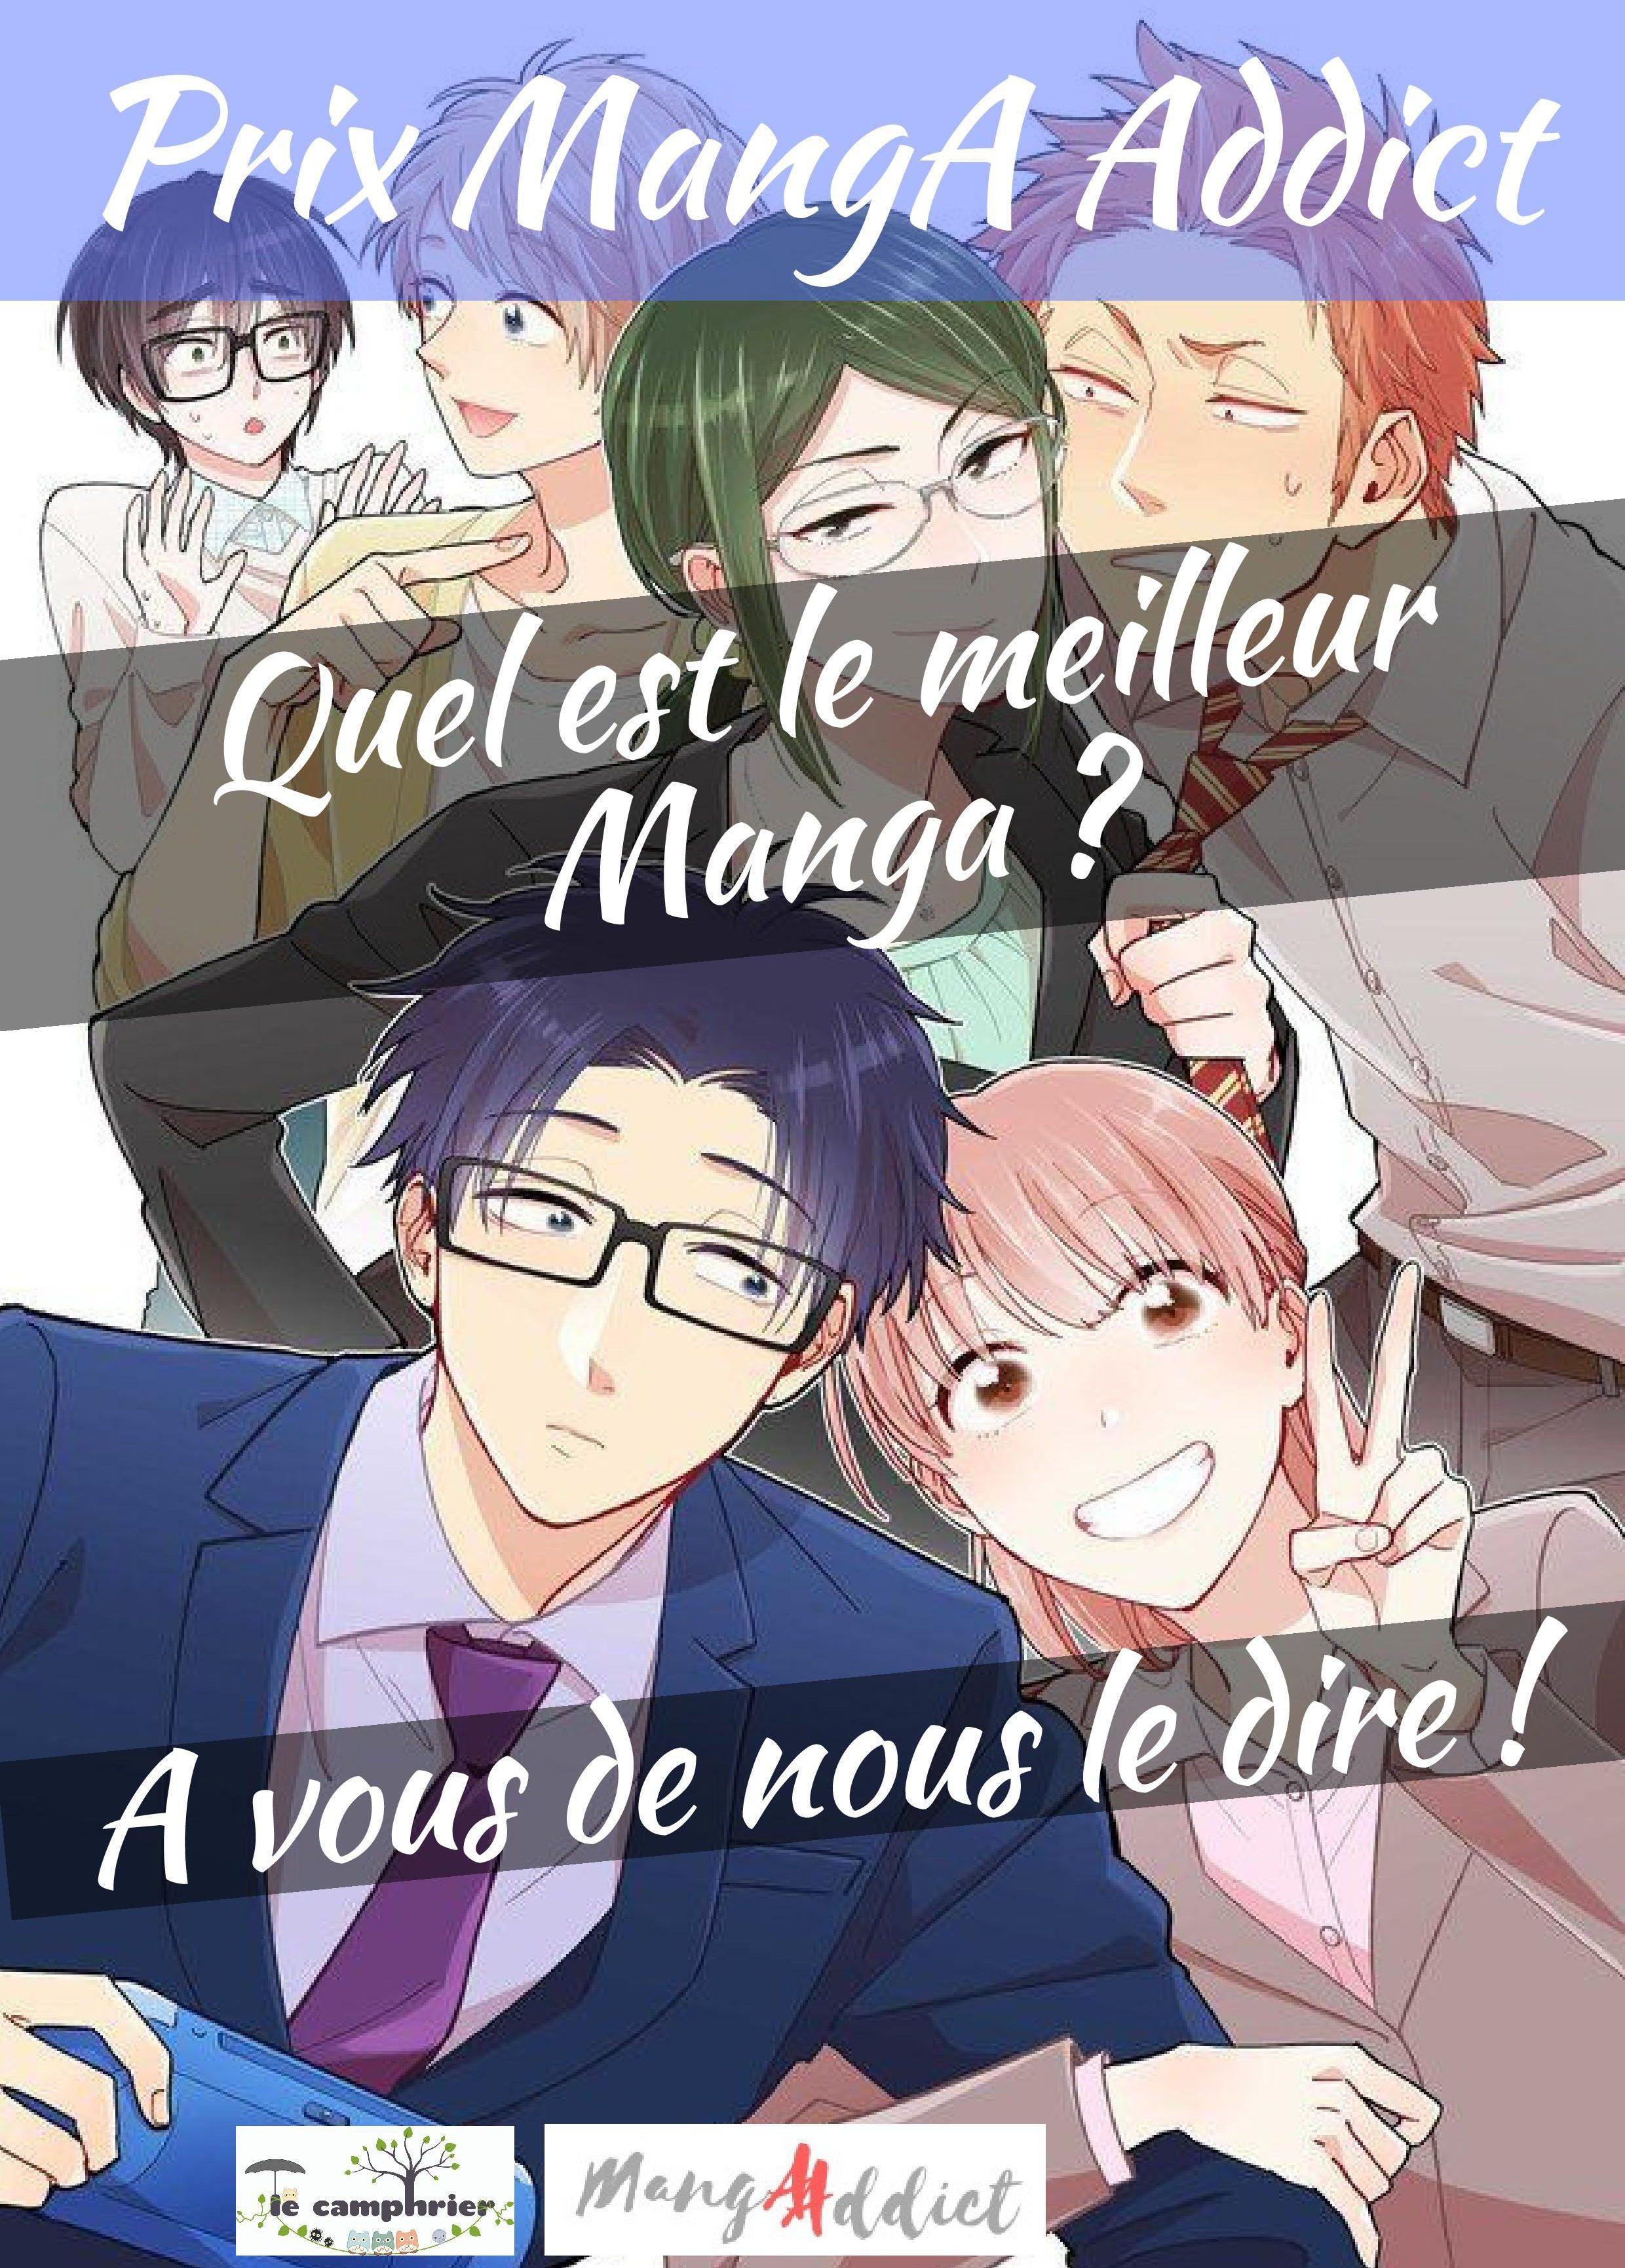 manga addict.jpg